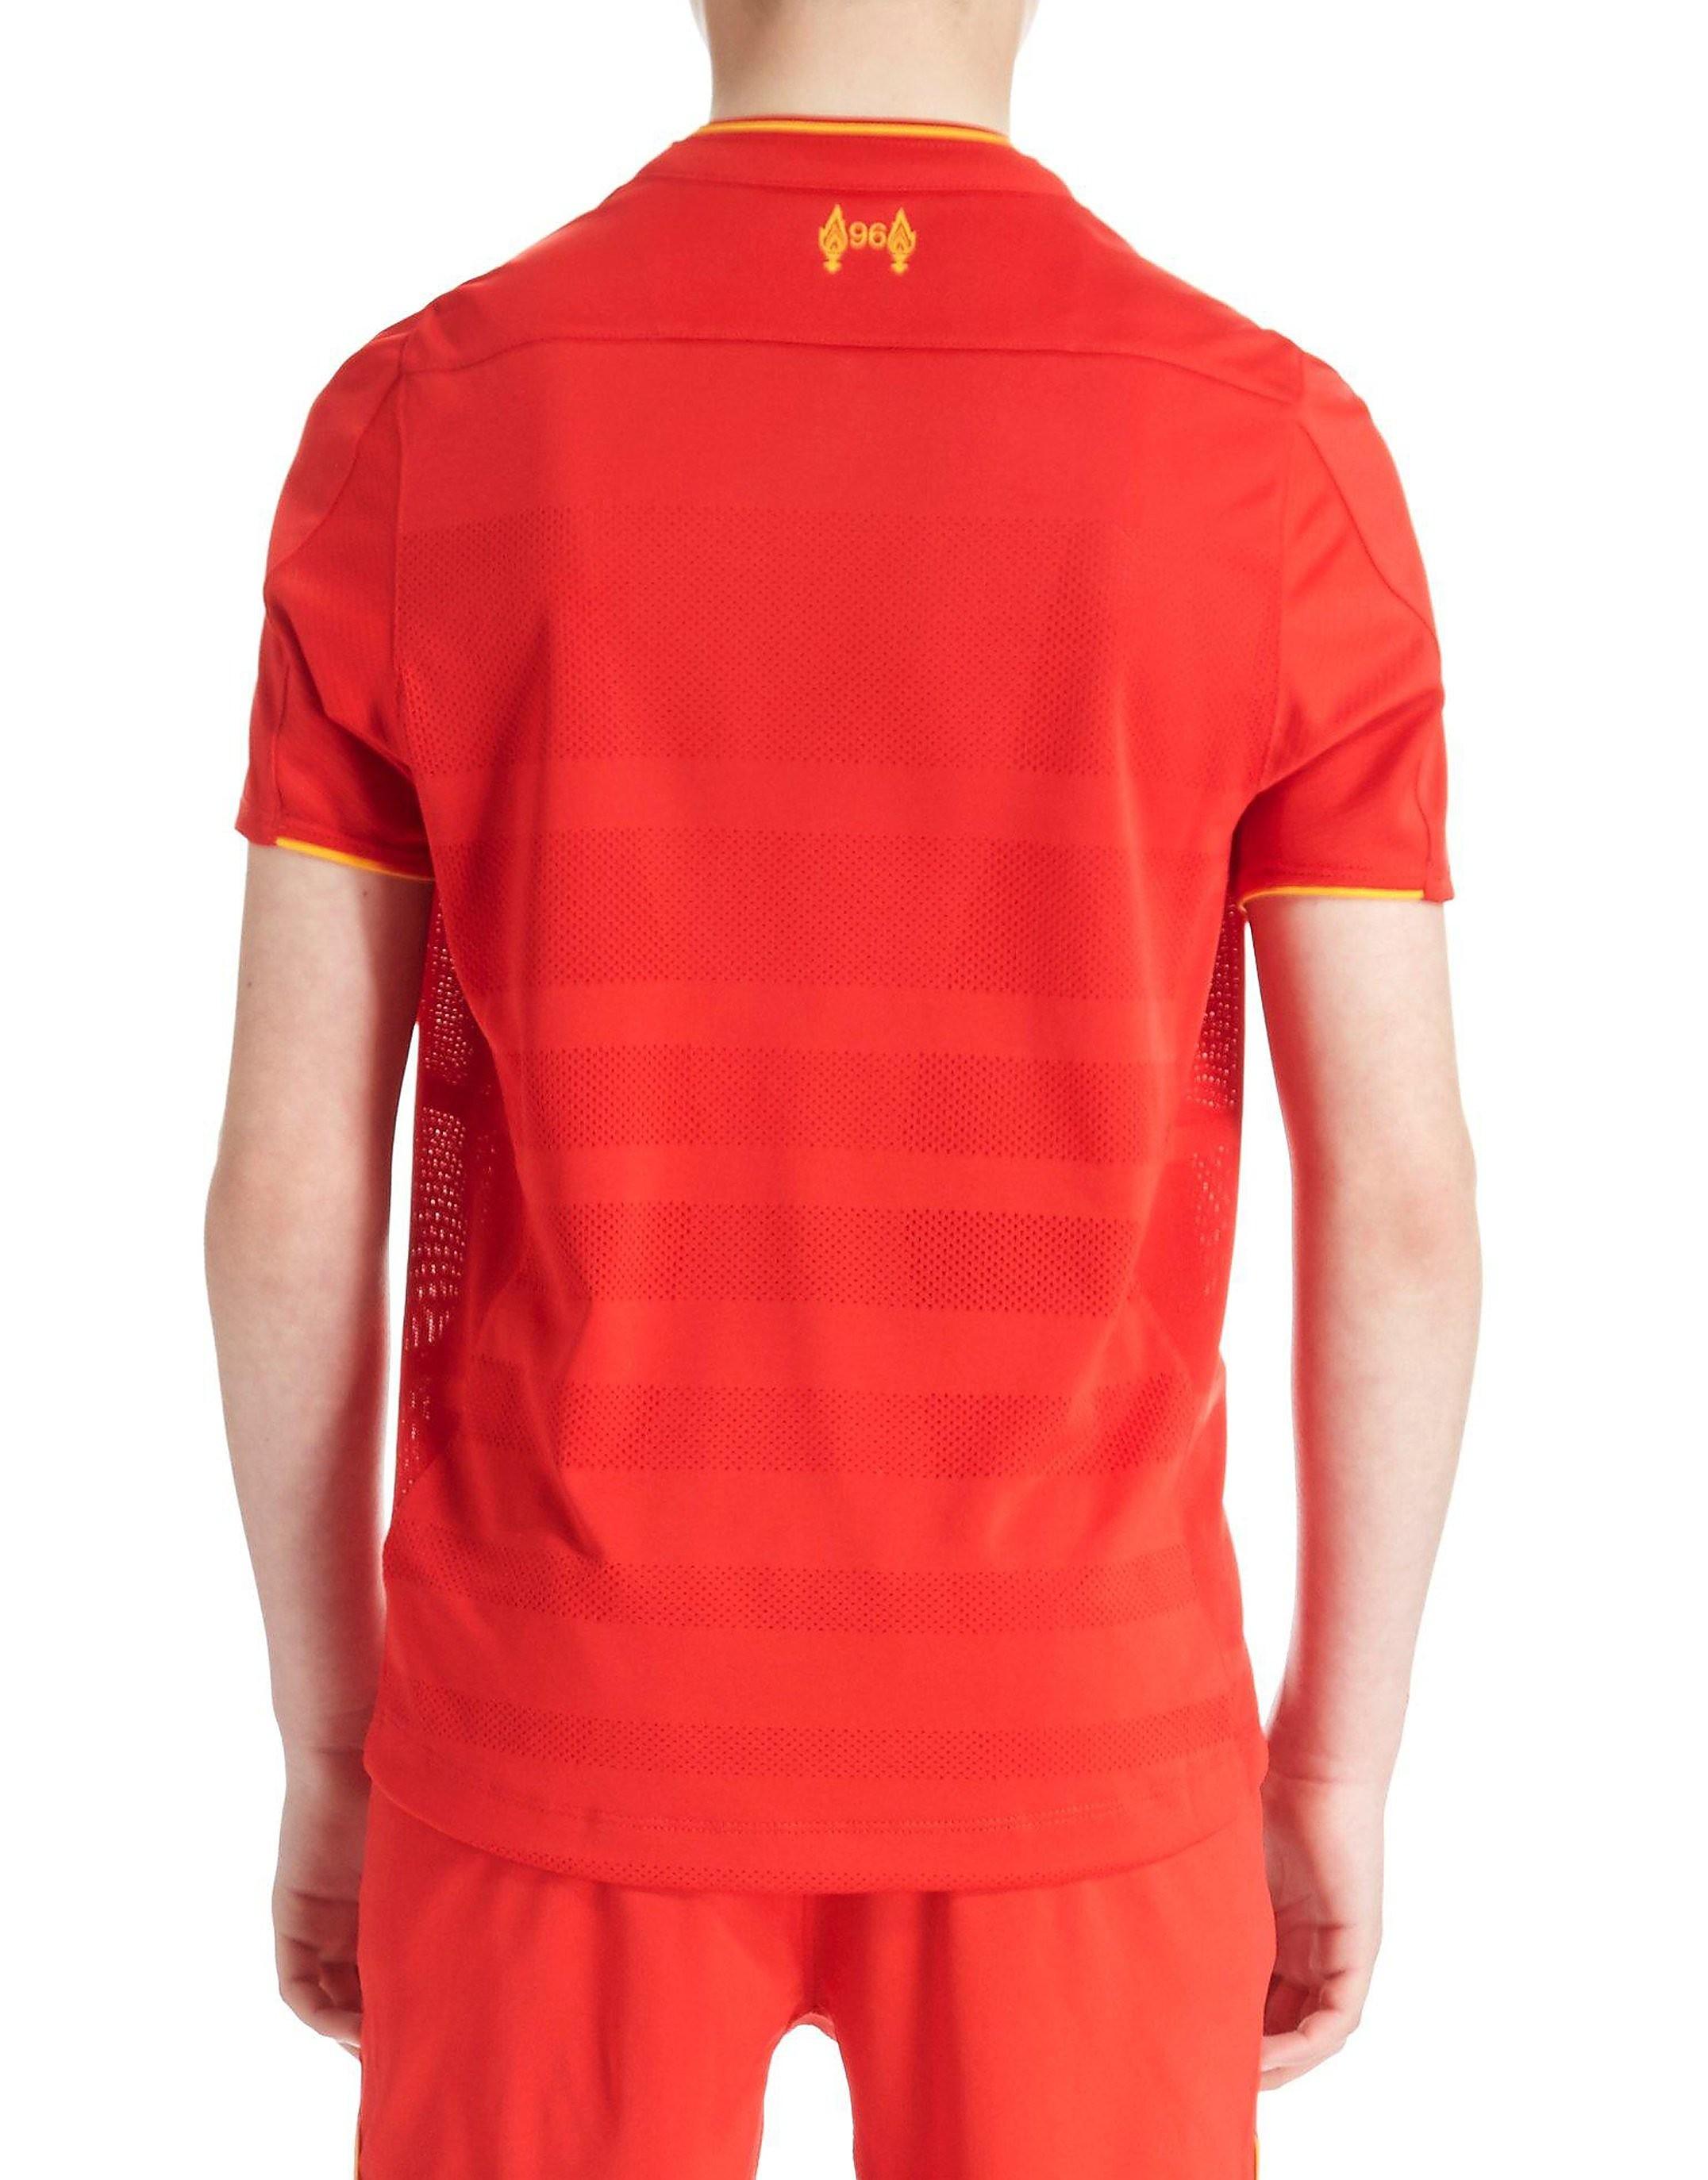 New Balance Liverpool FC 2016/17 Home Shirt Junior